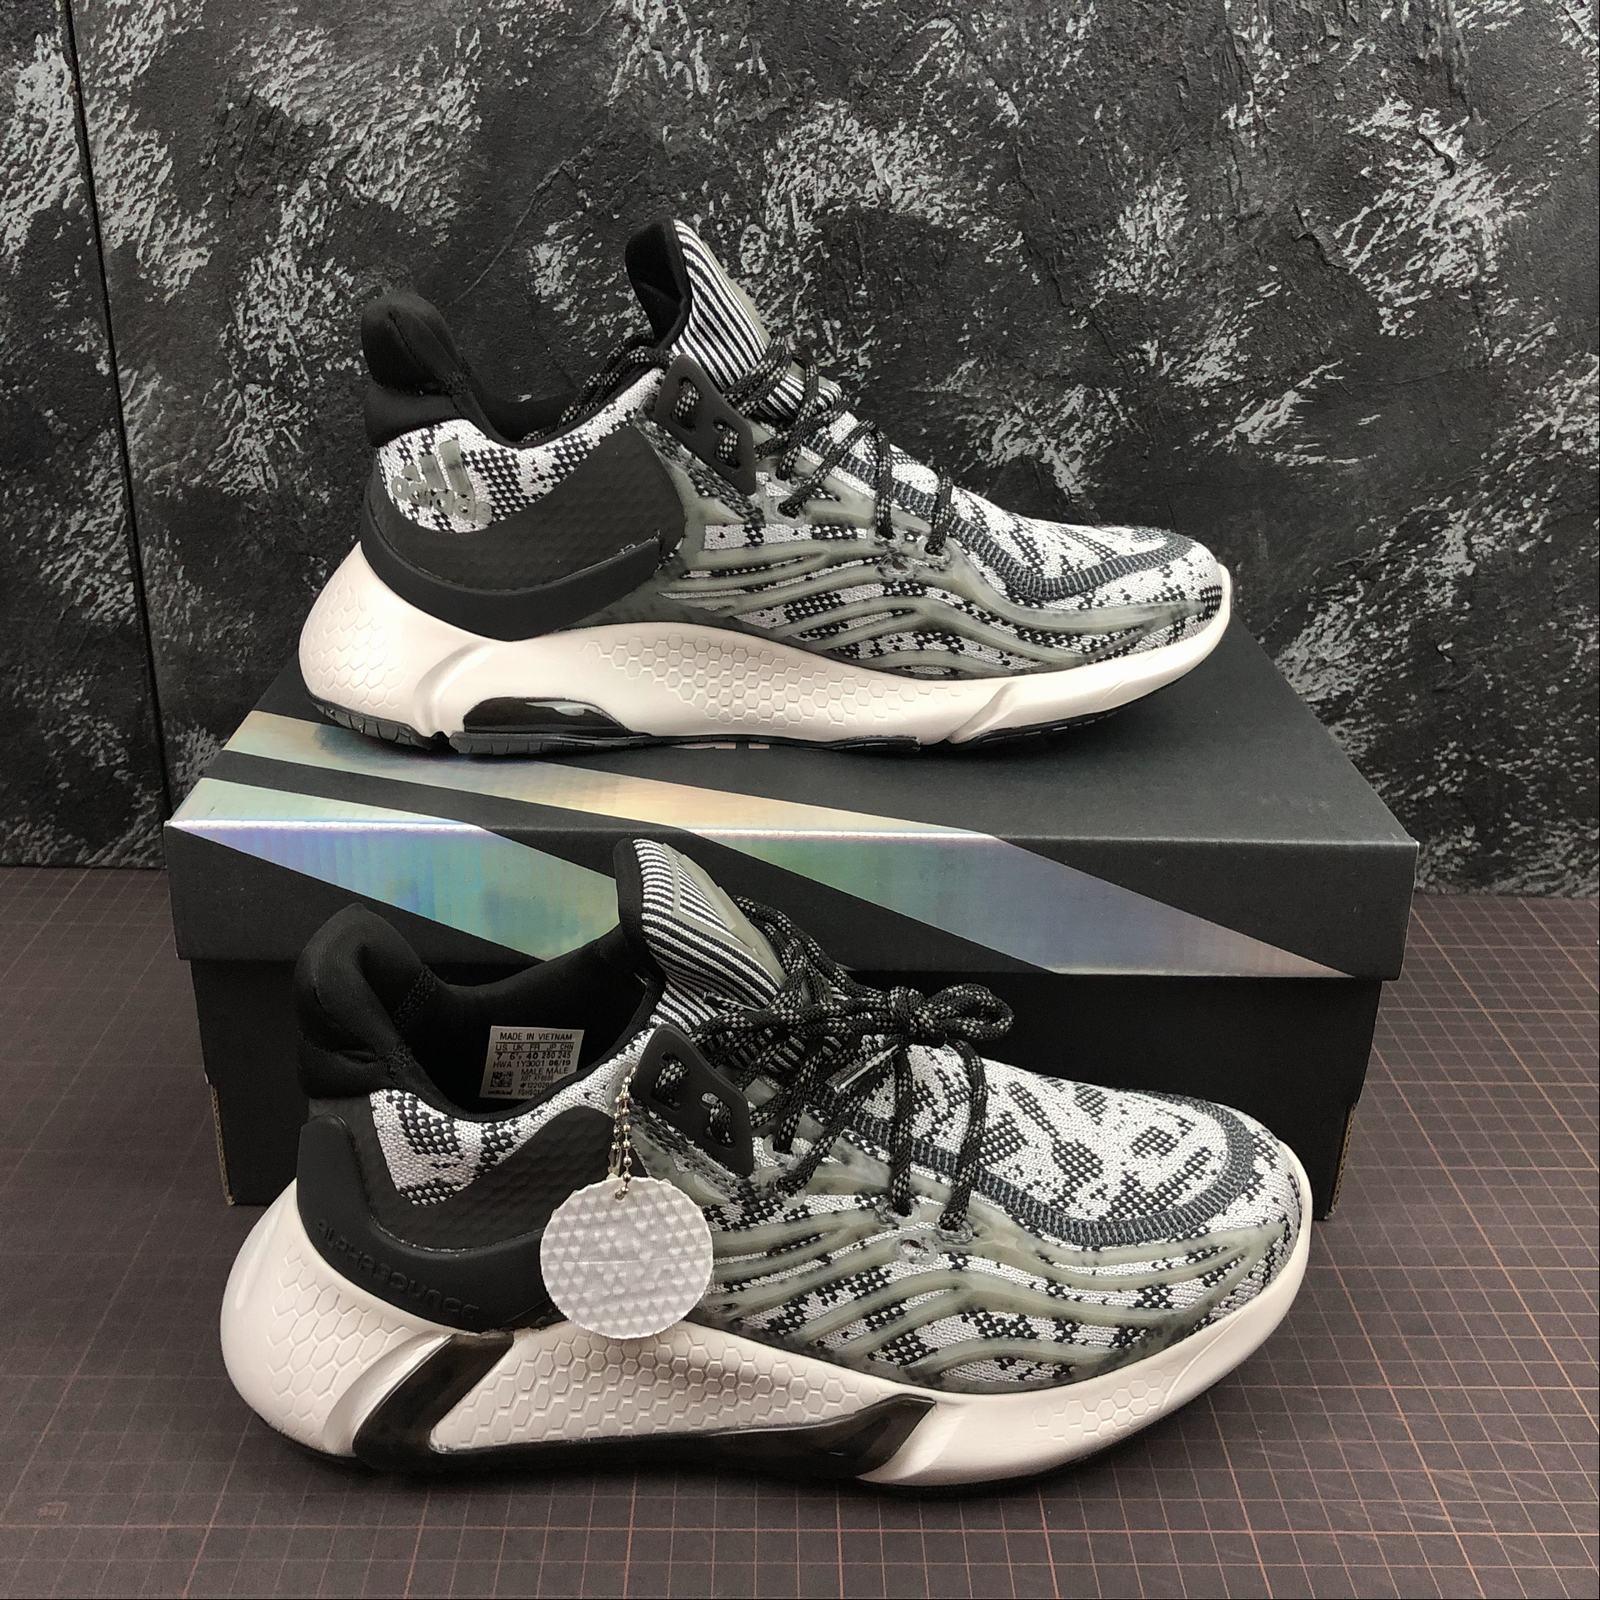 giay-sneaker-adidas-alphabounce-yeezy-boost-ay6686-black